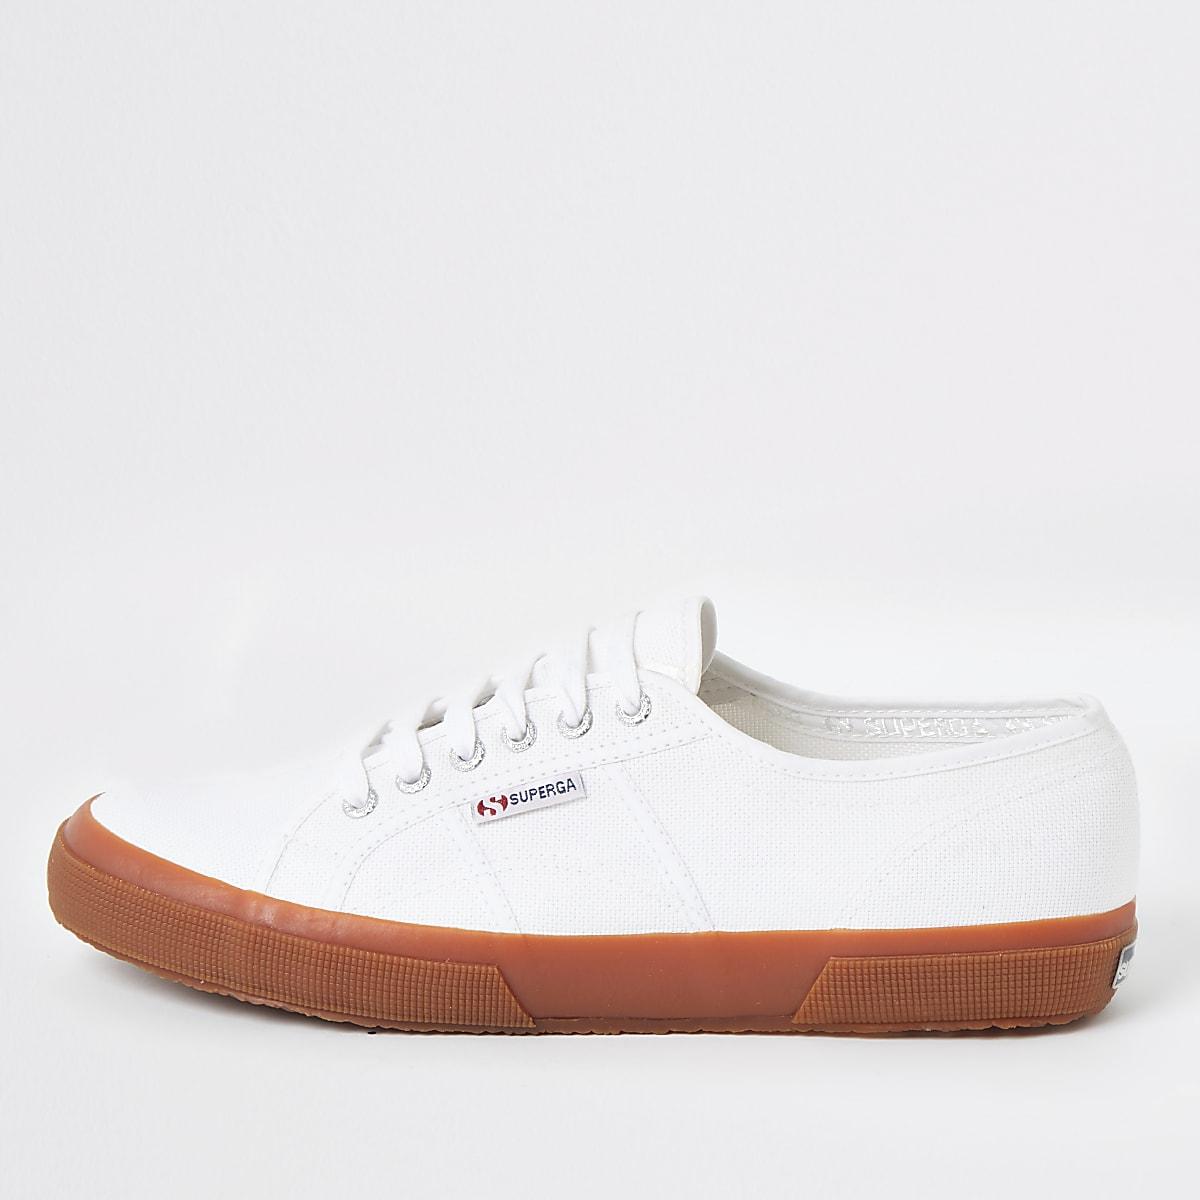 Superga white gum sole runner sneakers